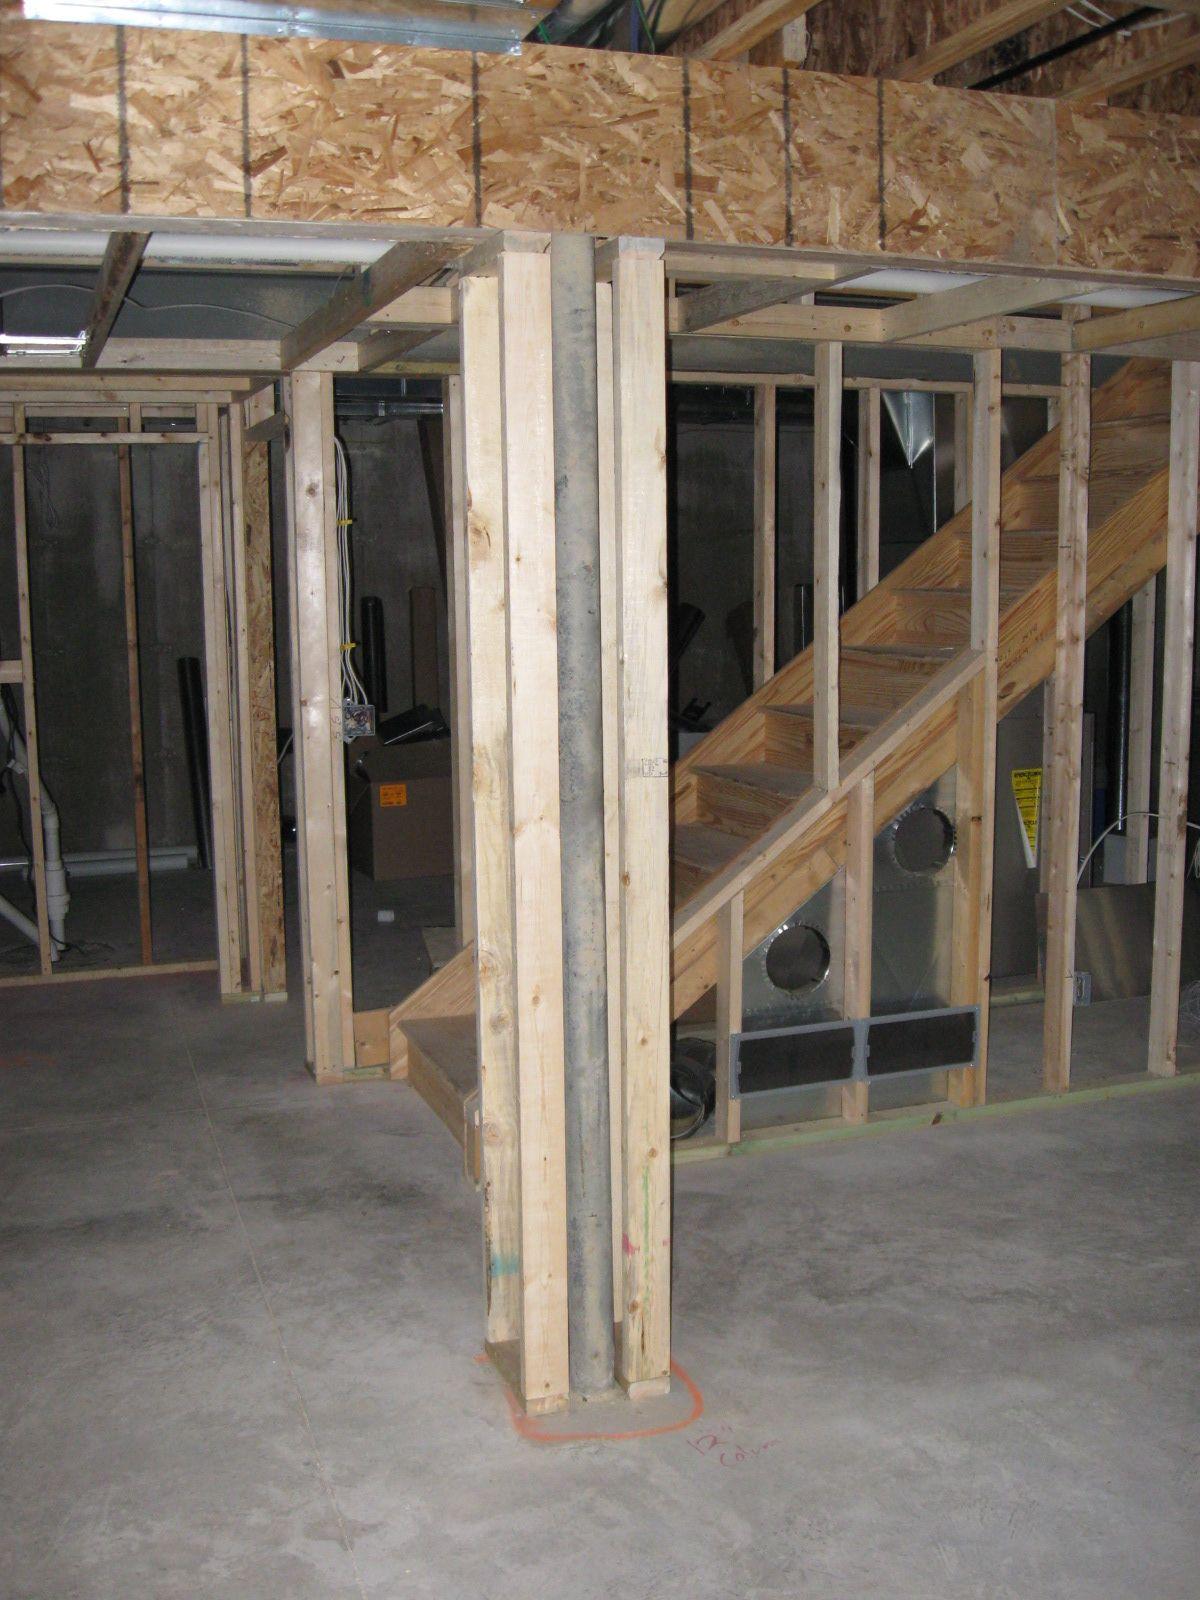 Finished Basement Designs - Finished Basement Pre Planning Checklist, Part Ii